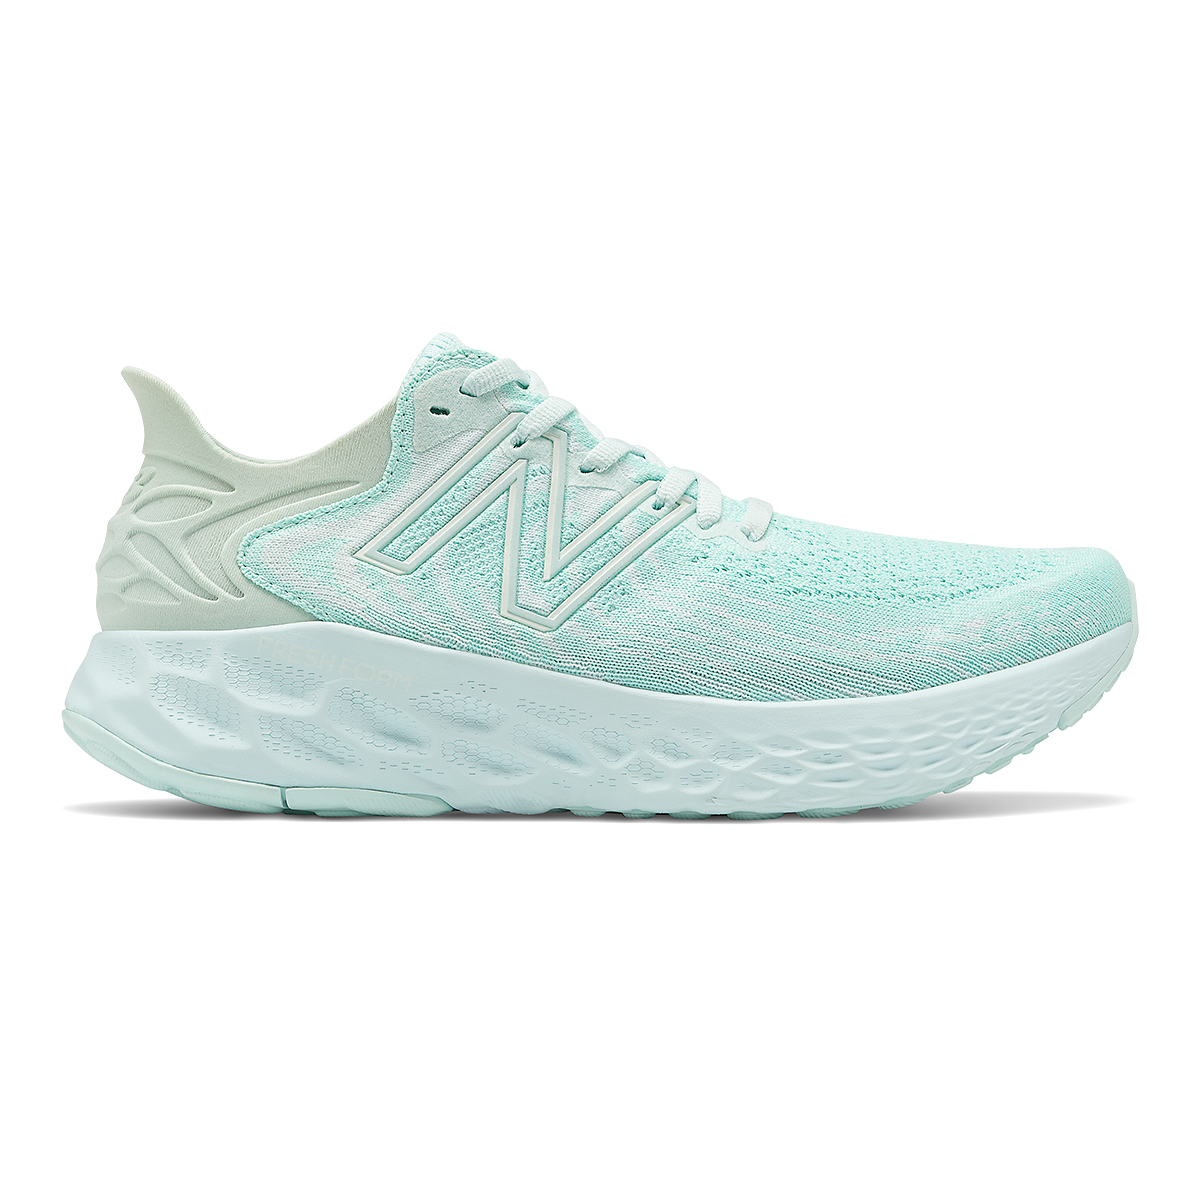 Women's New Balance Fresh Foam 1080V11 Running Shoe - Color: White Mint/White Jade - Size: 13 - Width: Regular, Mint Green, large, image 1